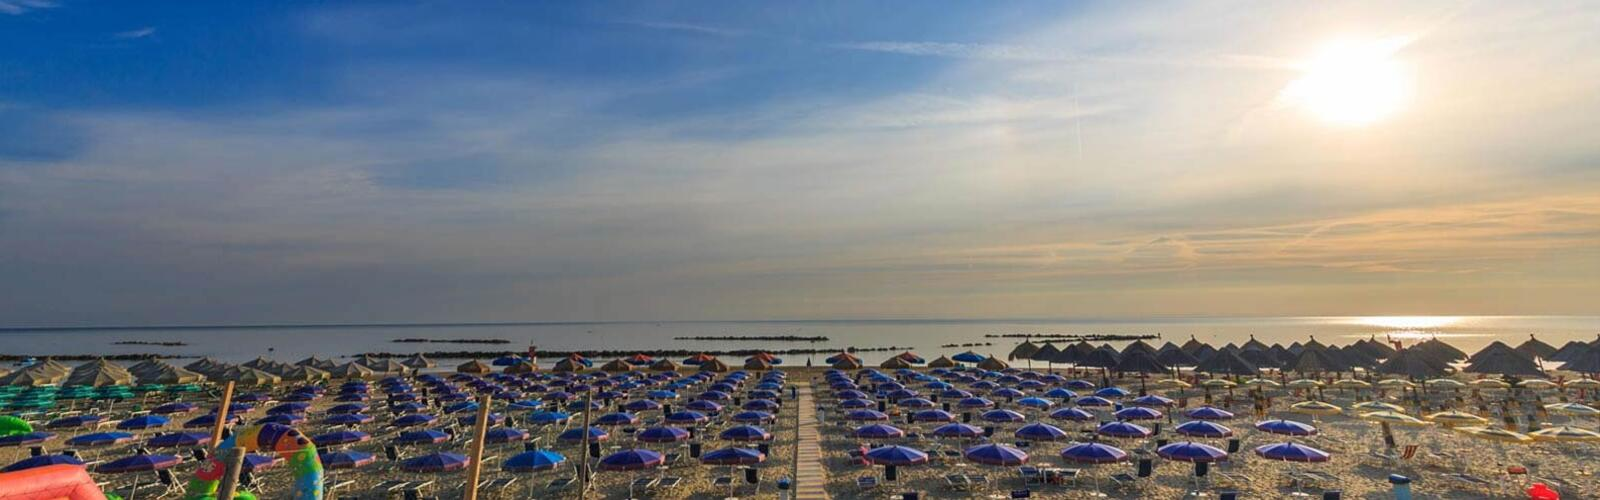 hotellaninfea en beach 002